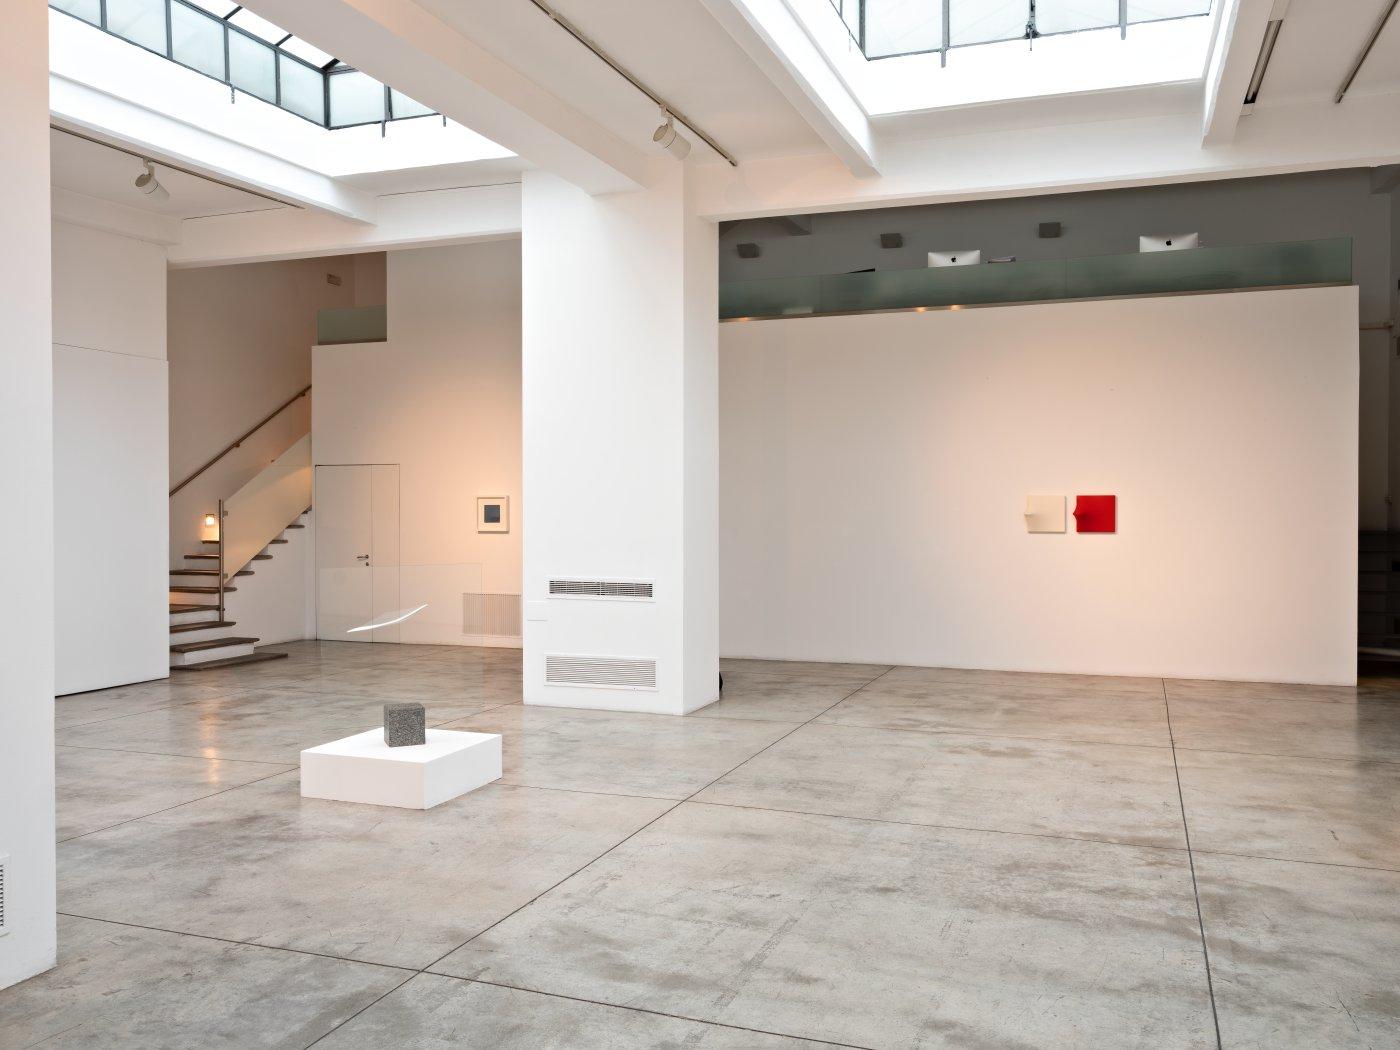 Cardi Gallery Milan Agostino Bonalumi 3